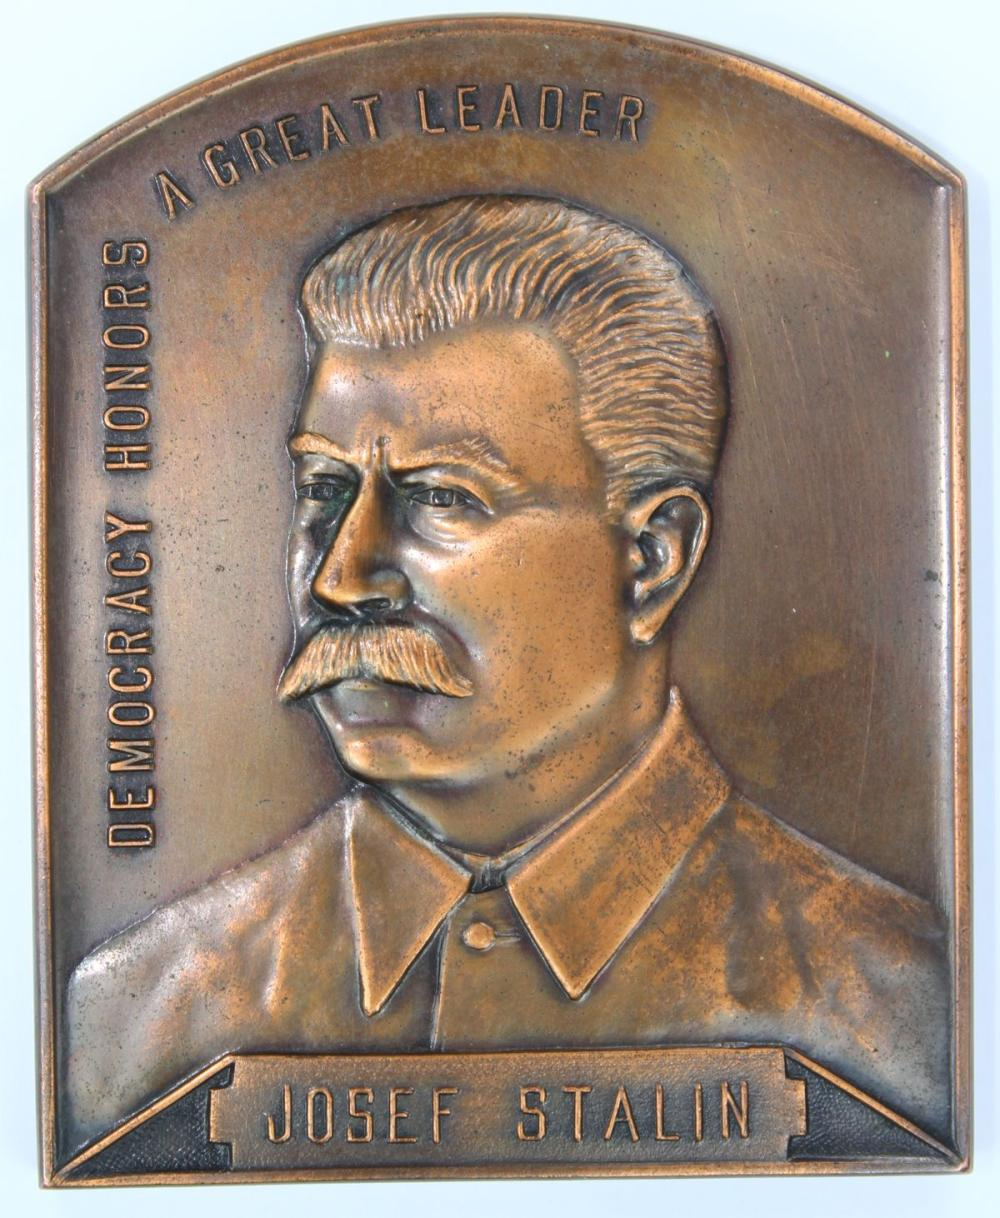 Joseph Stalin Medal by Amors (Sydney) circa 1940 Uncirculated